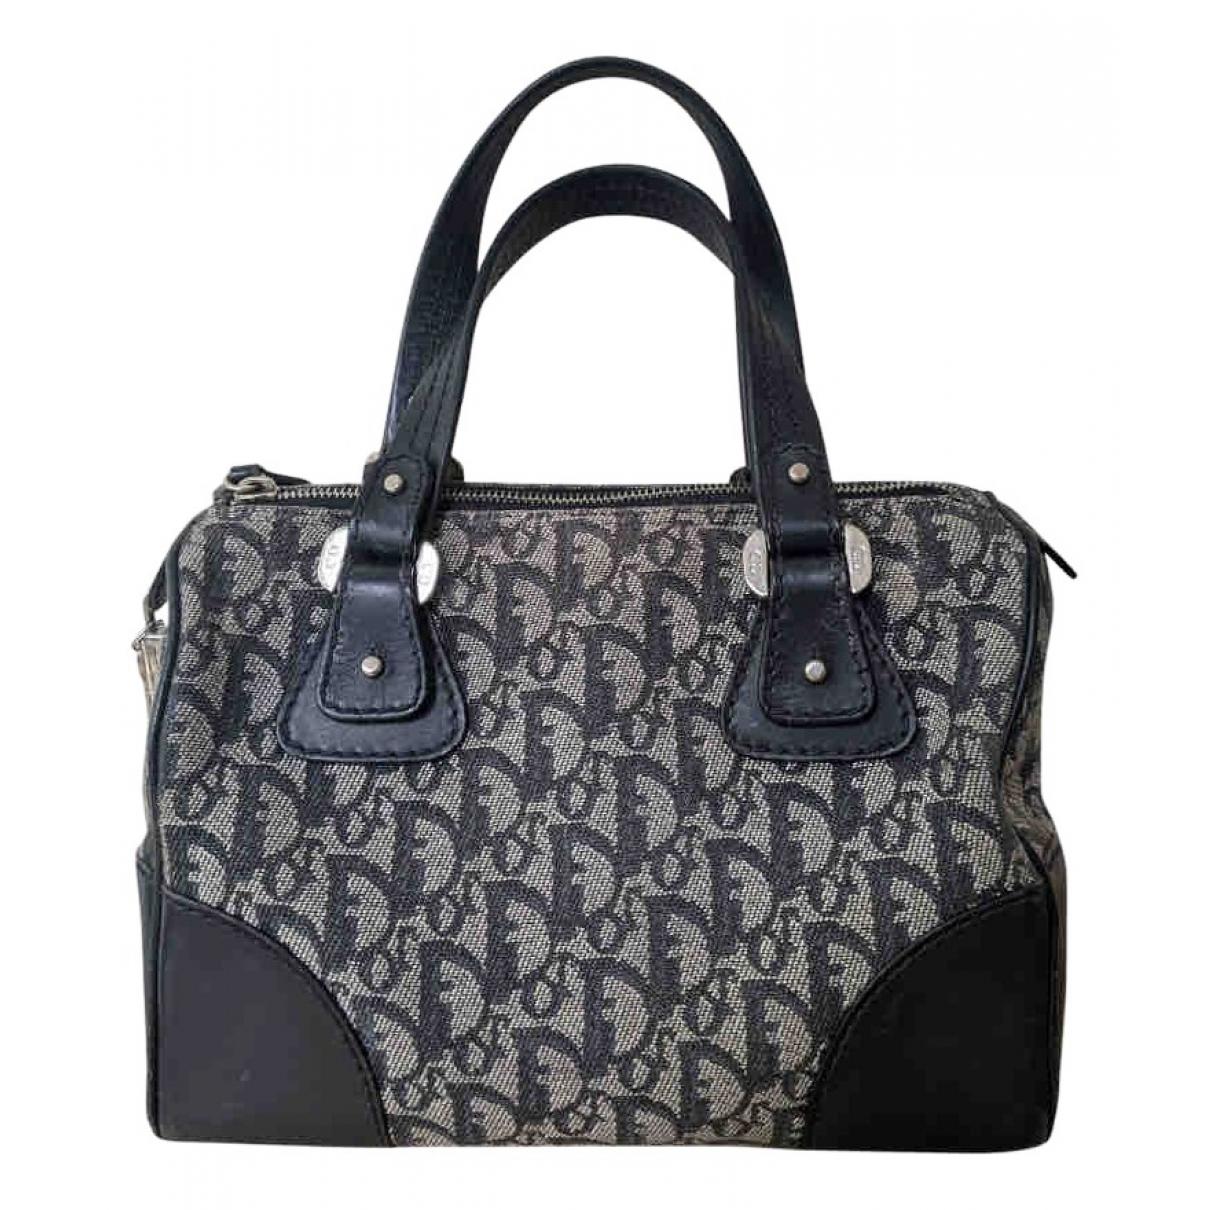 Dior Speedy Navy Cloth handbag for Women N